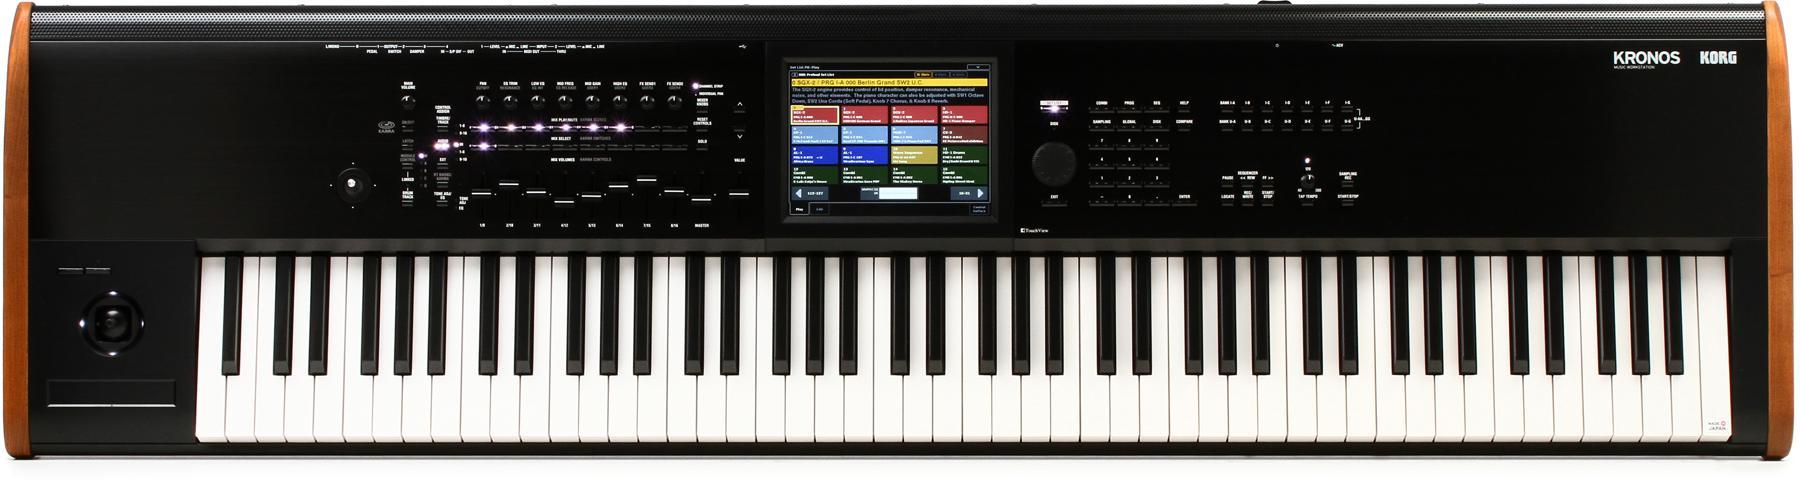 3. Korg KRONOS2 88 Key (KRONOS8)